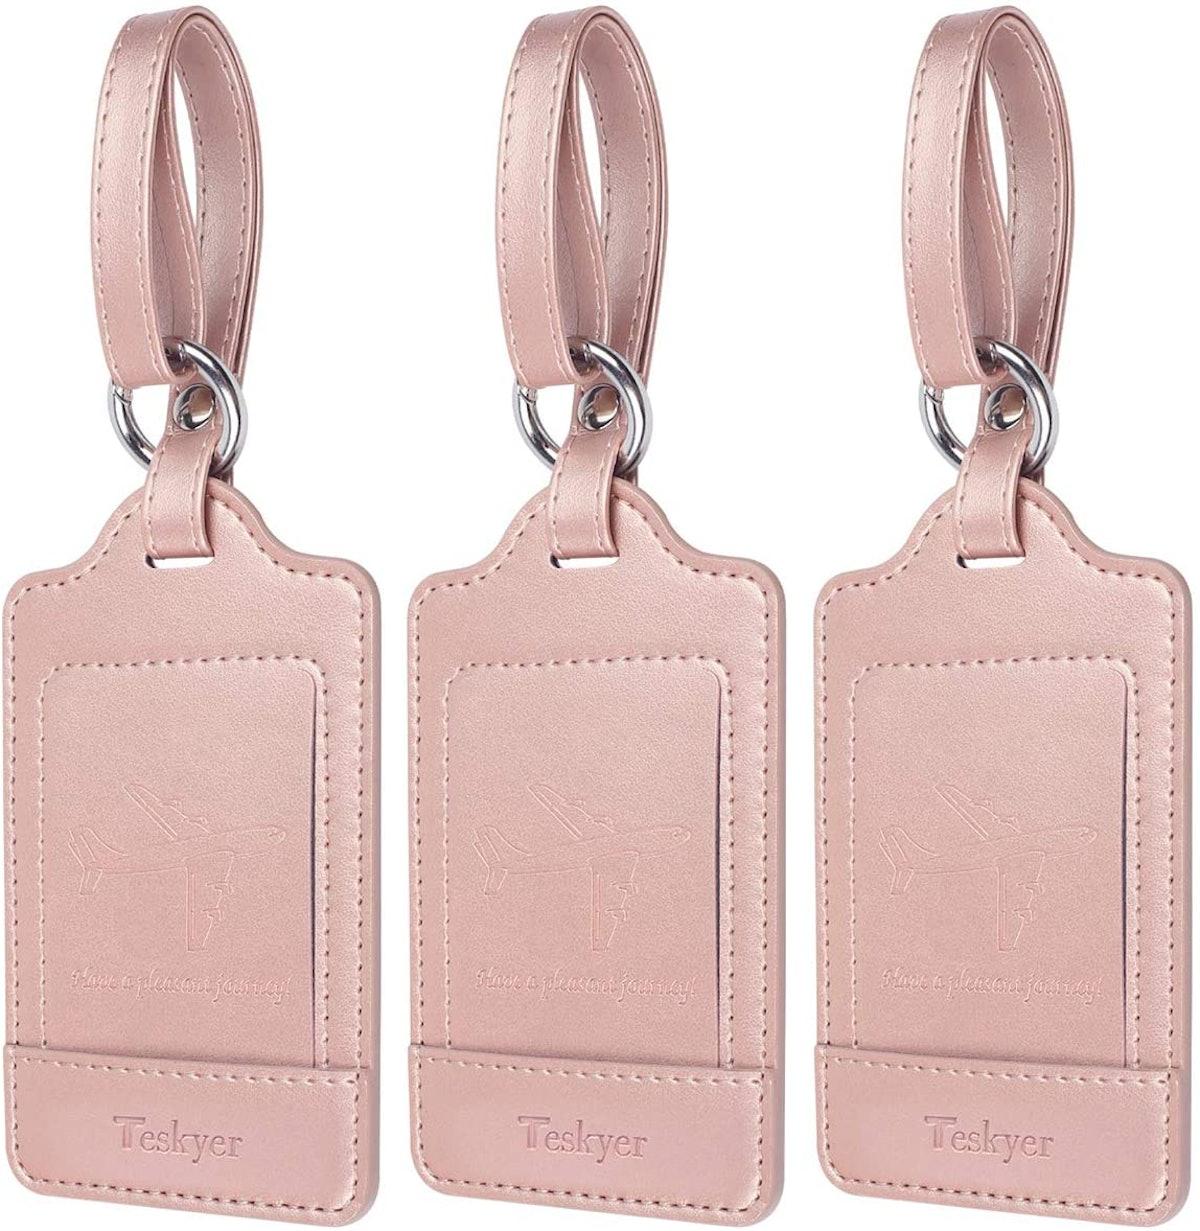 Luggage Tags, 3 Pack Teskyer Premium